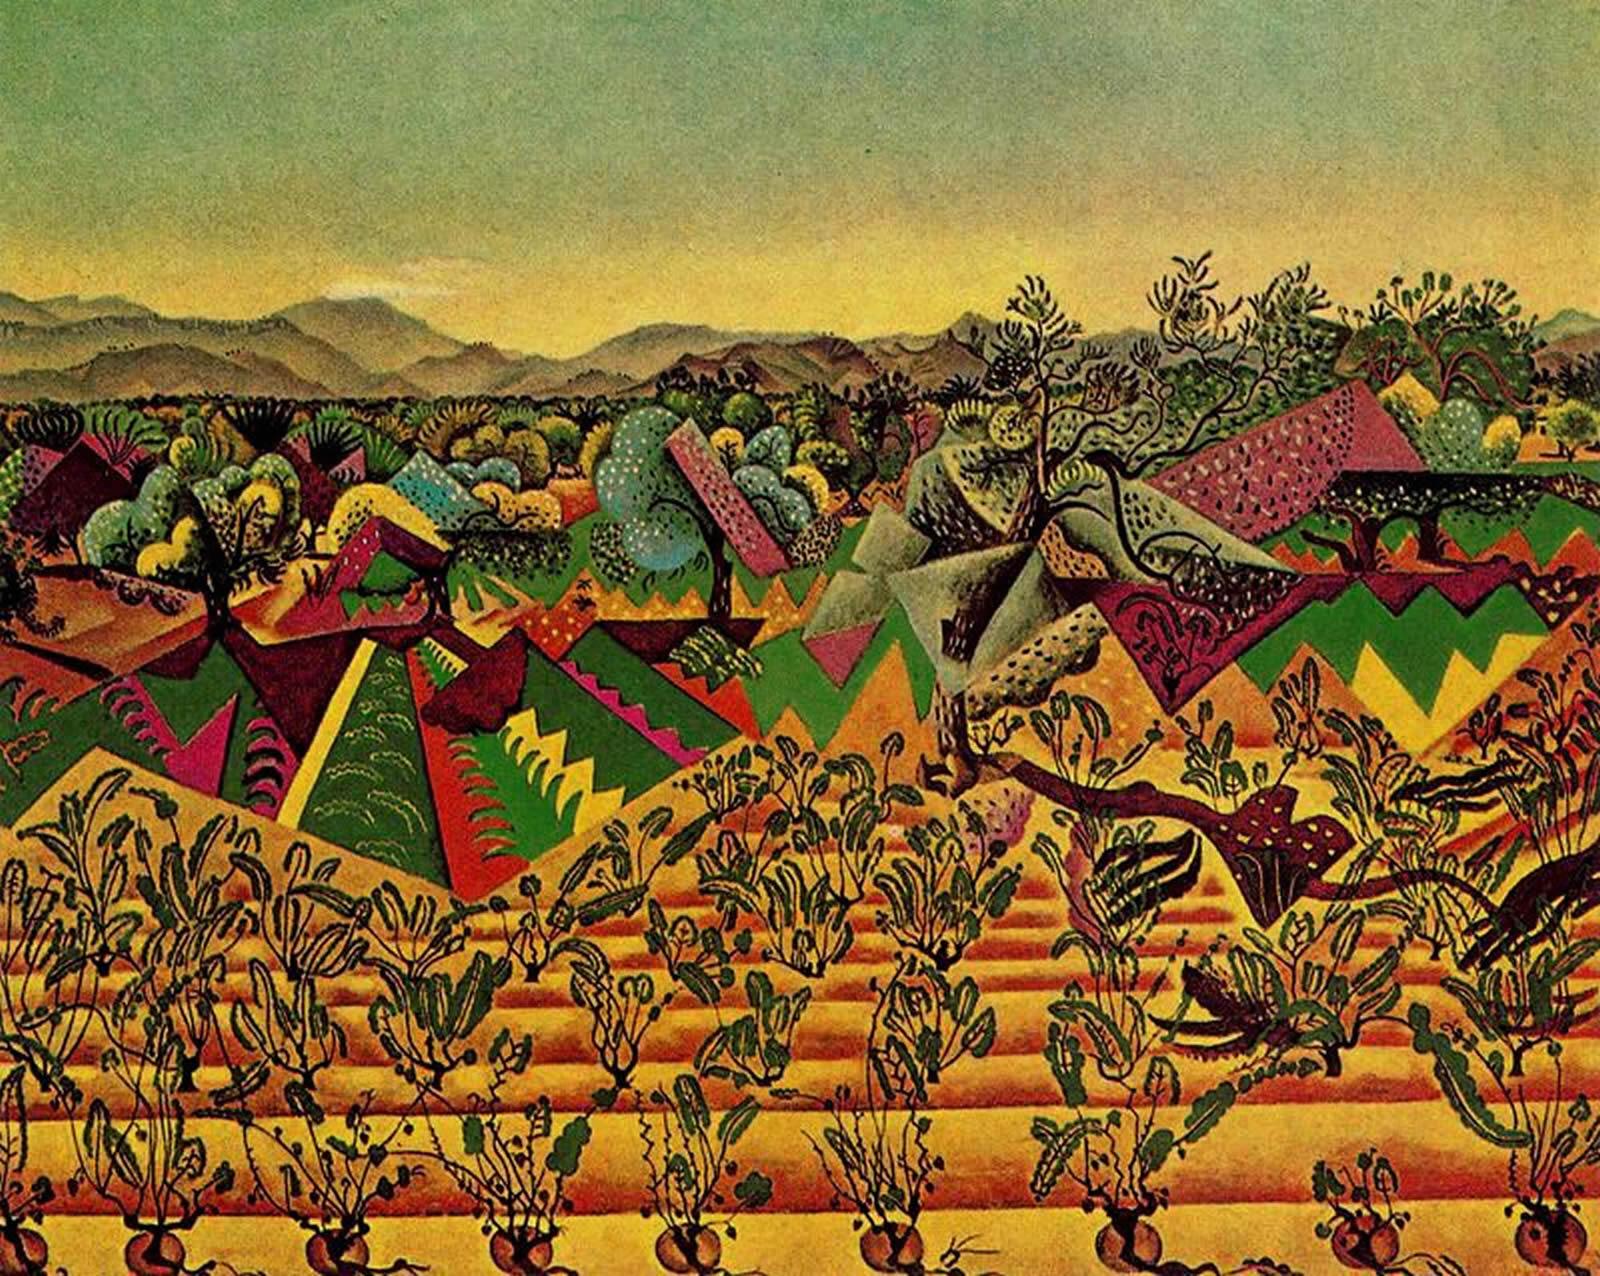 Olive Grove In Montroig - Joan Miro Wallpaper Image